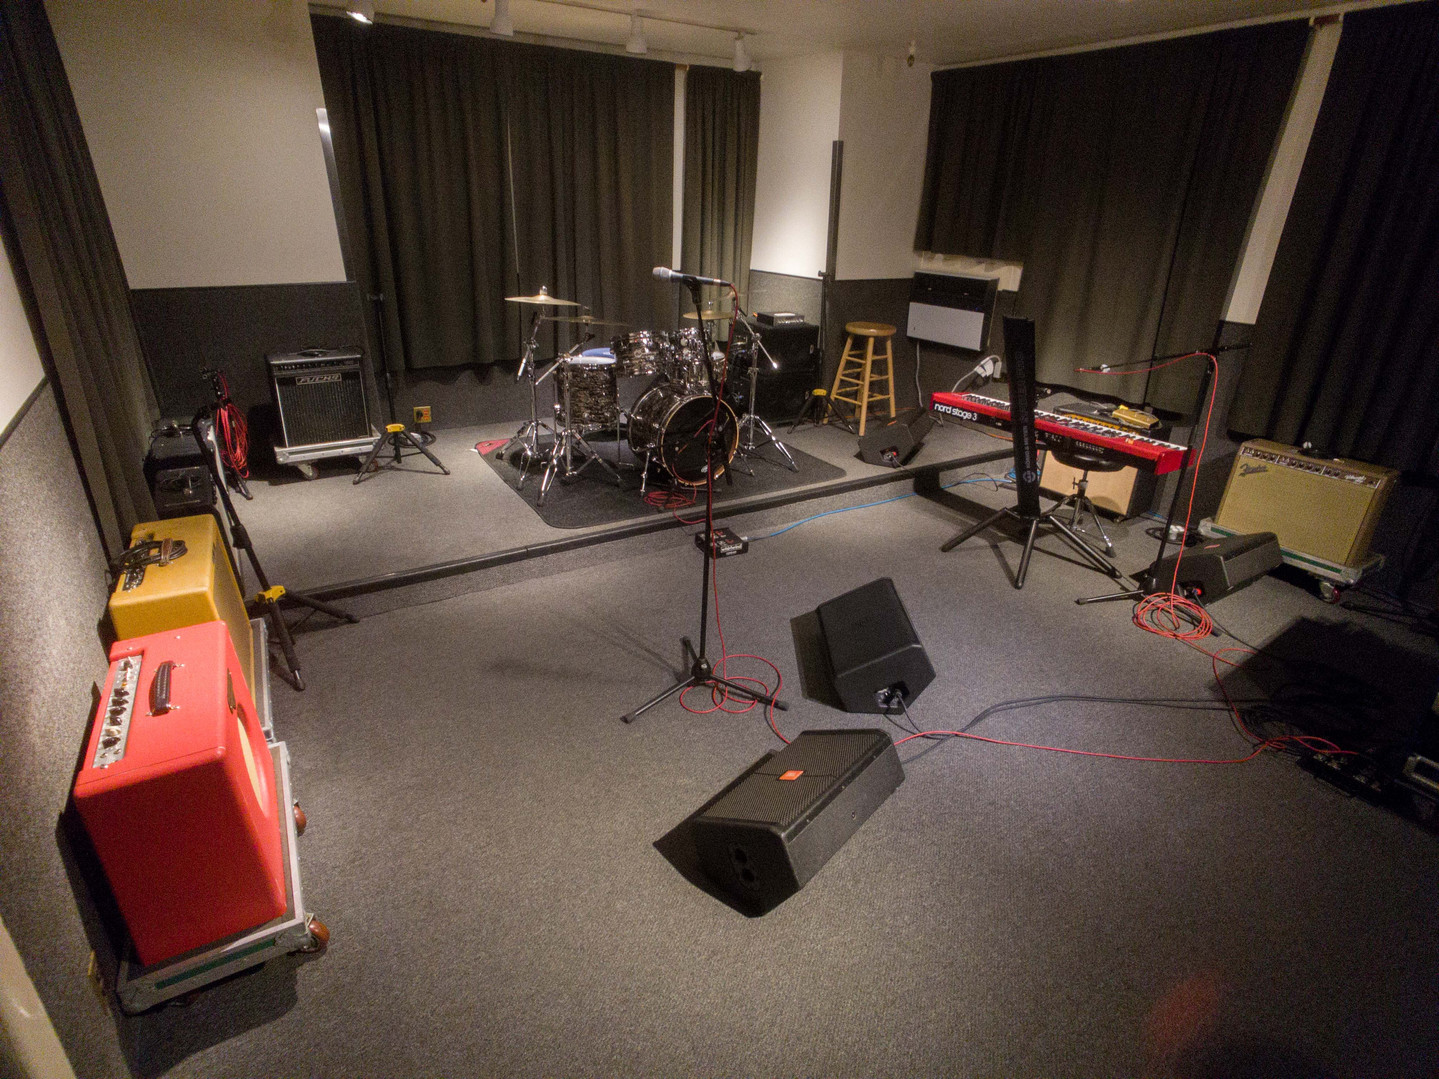 Studio 3 with keyboard